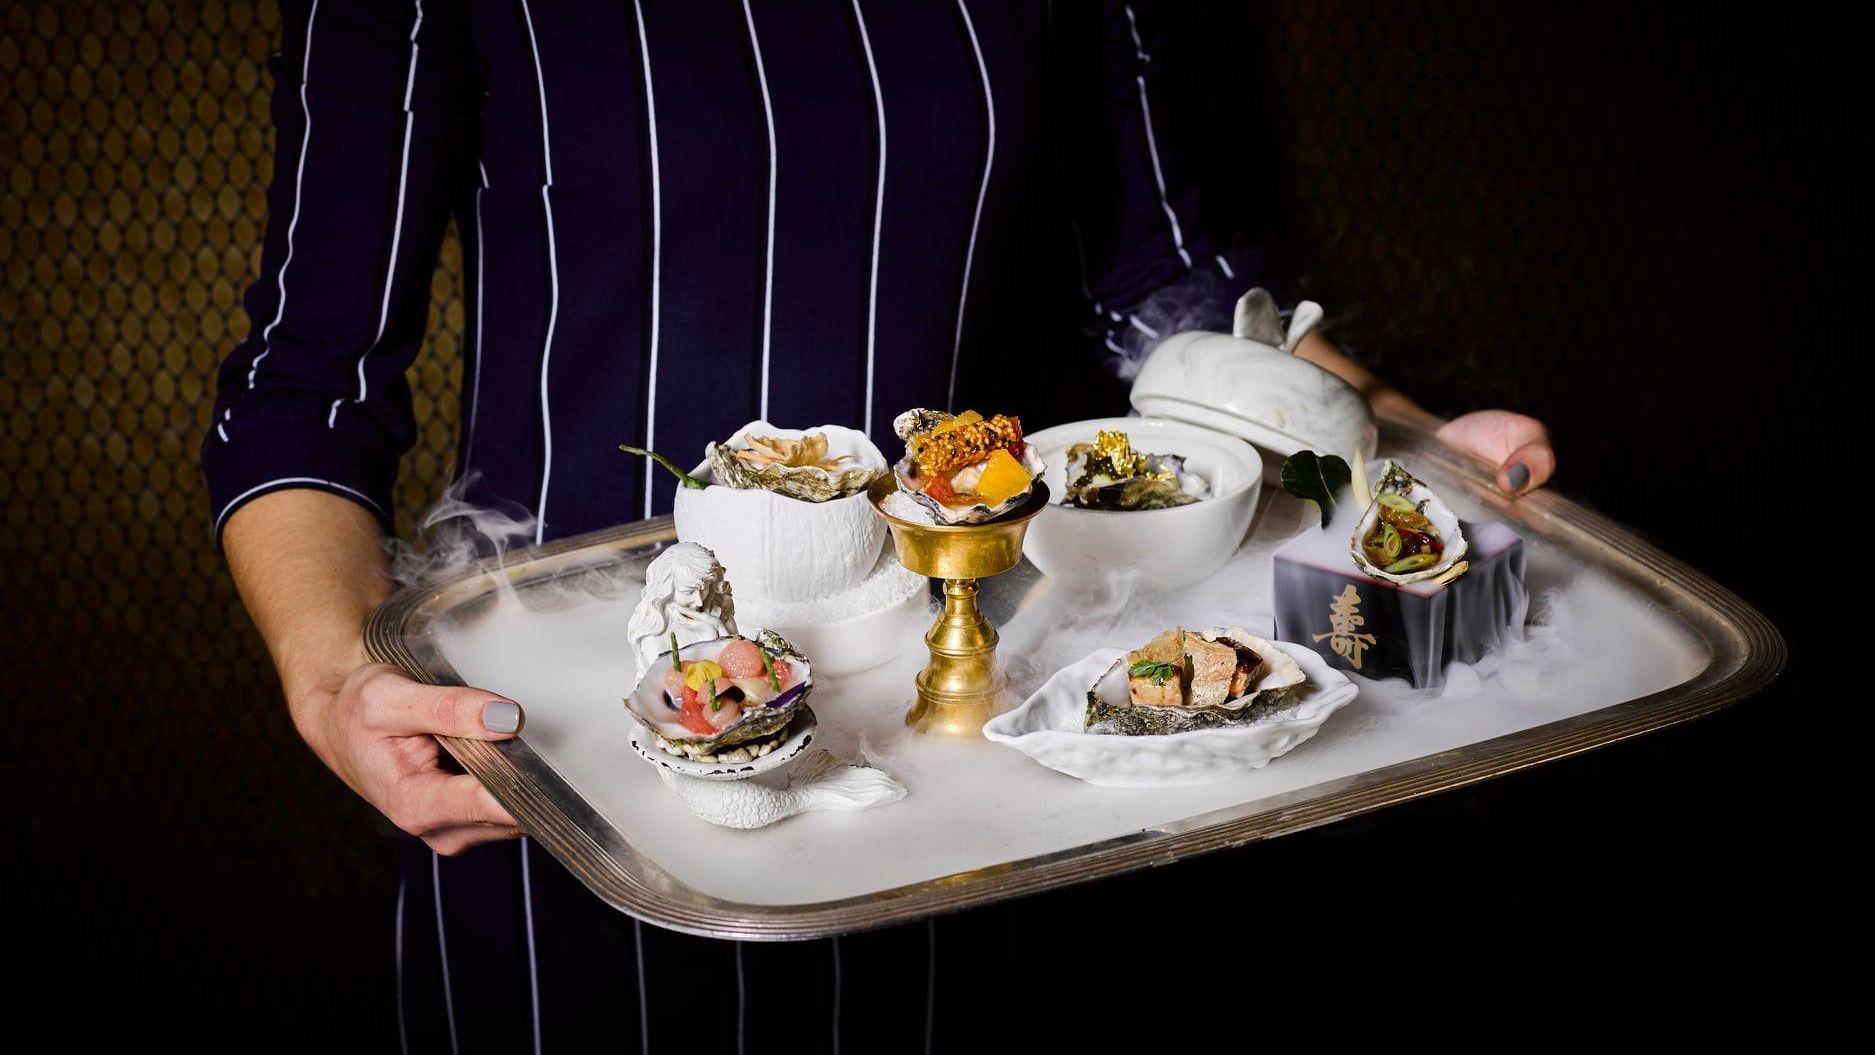 culinaire hotel arrangementen the fork